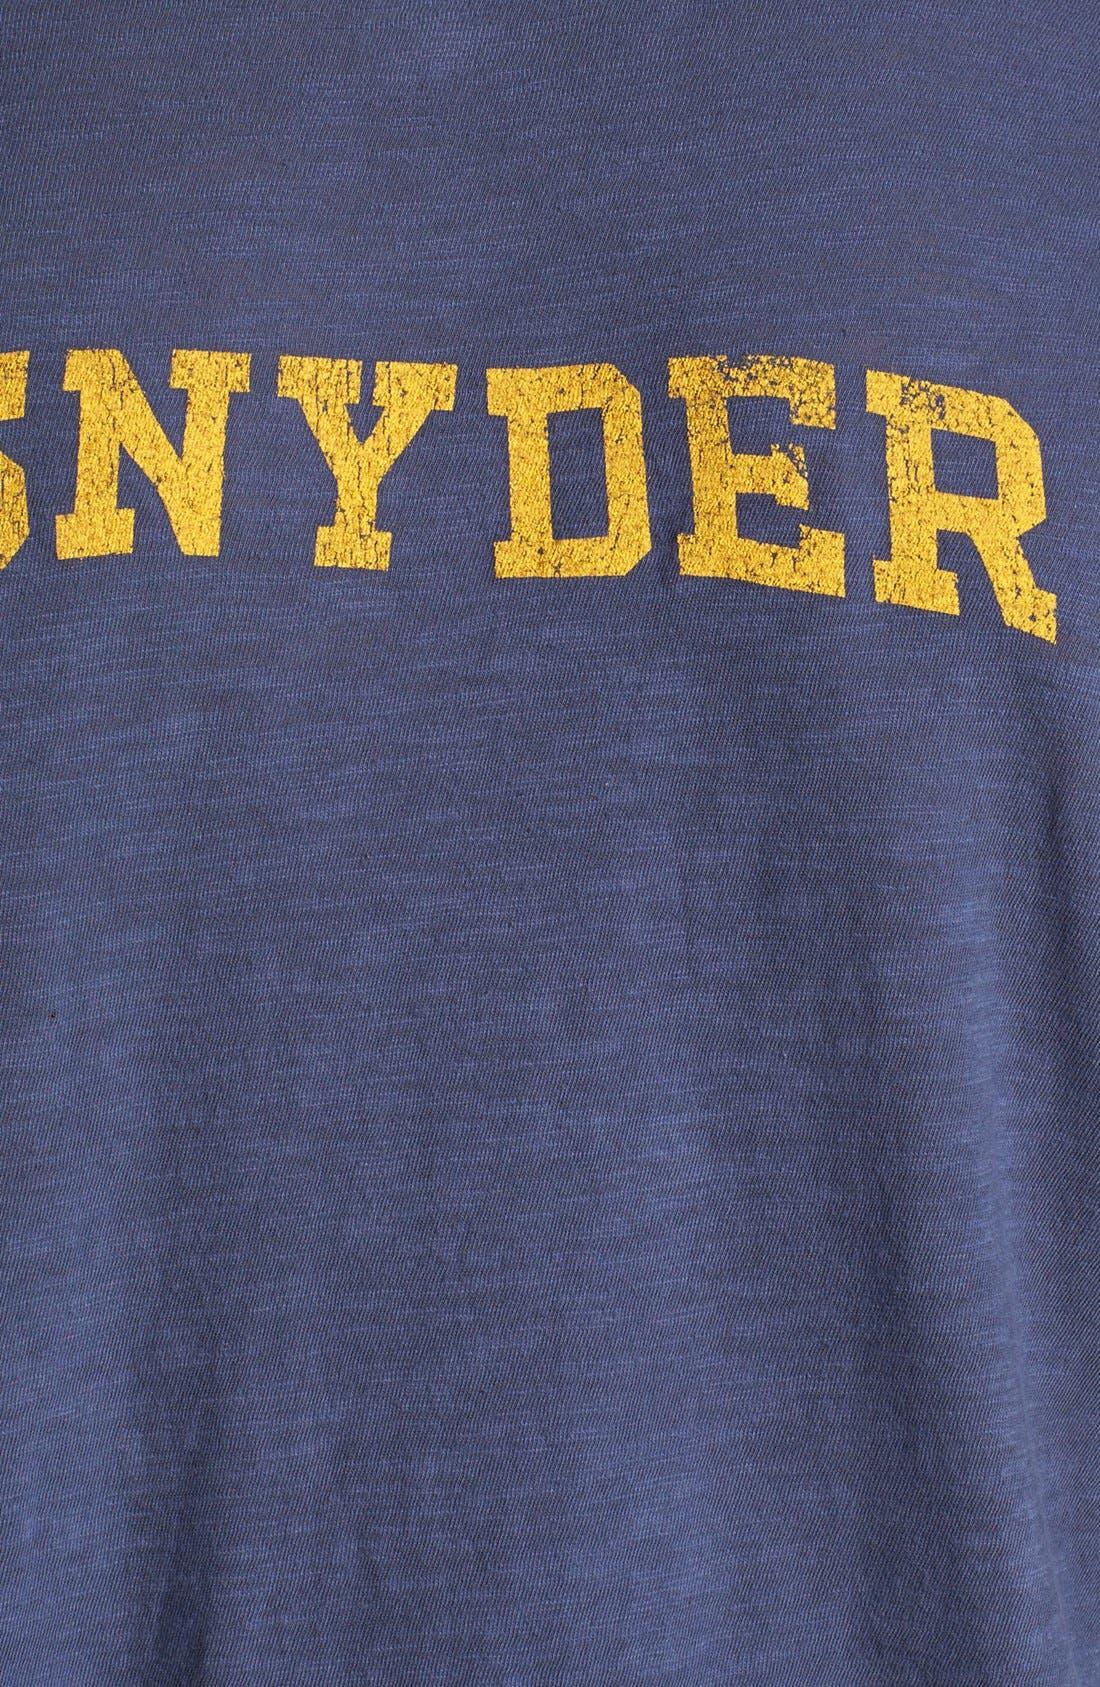 TODD SNYDER + CHAMPION, 'City Gym - Classic' Crewneck T-Shirt, Alternate thumbnail 2, color, 410